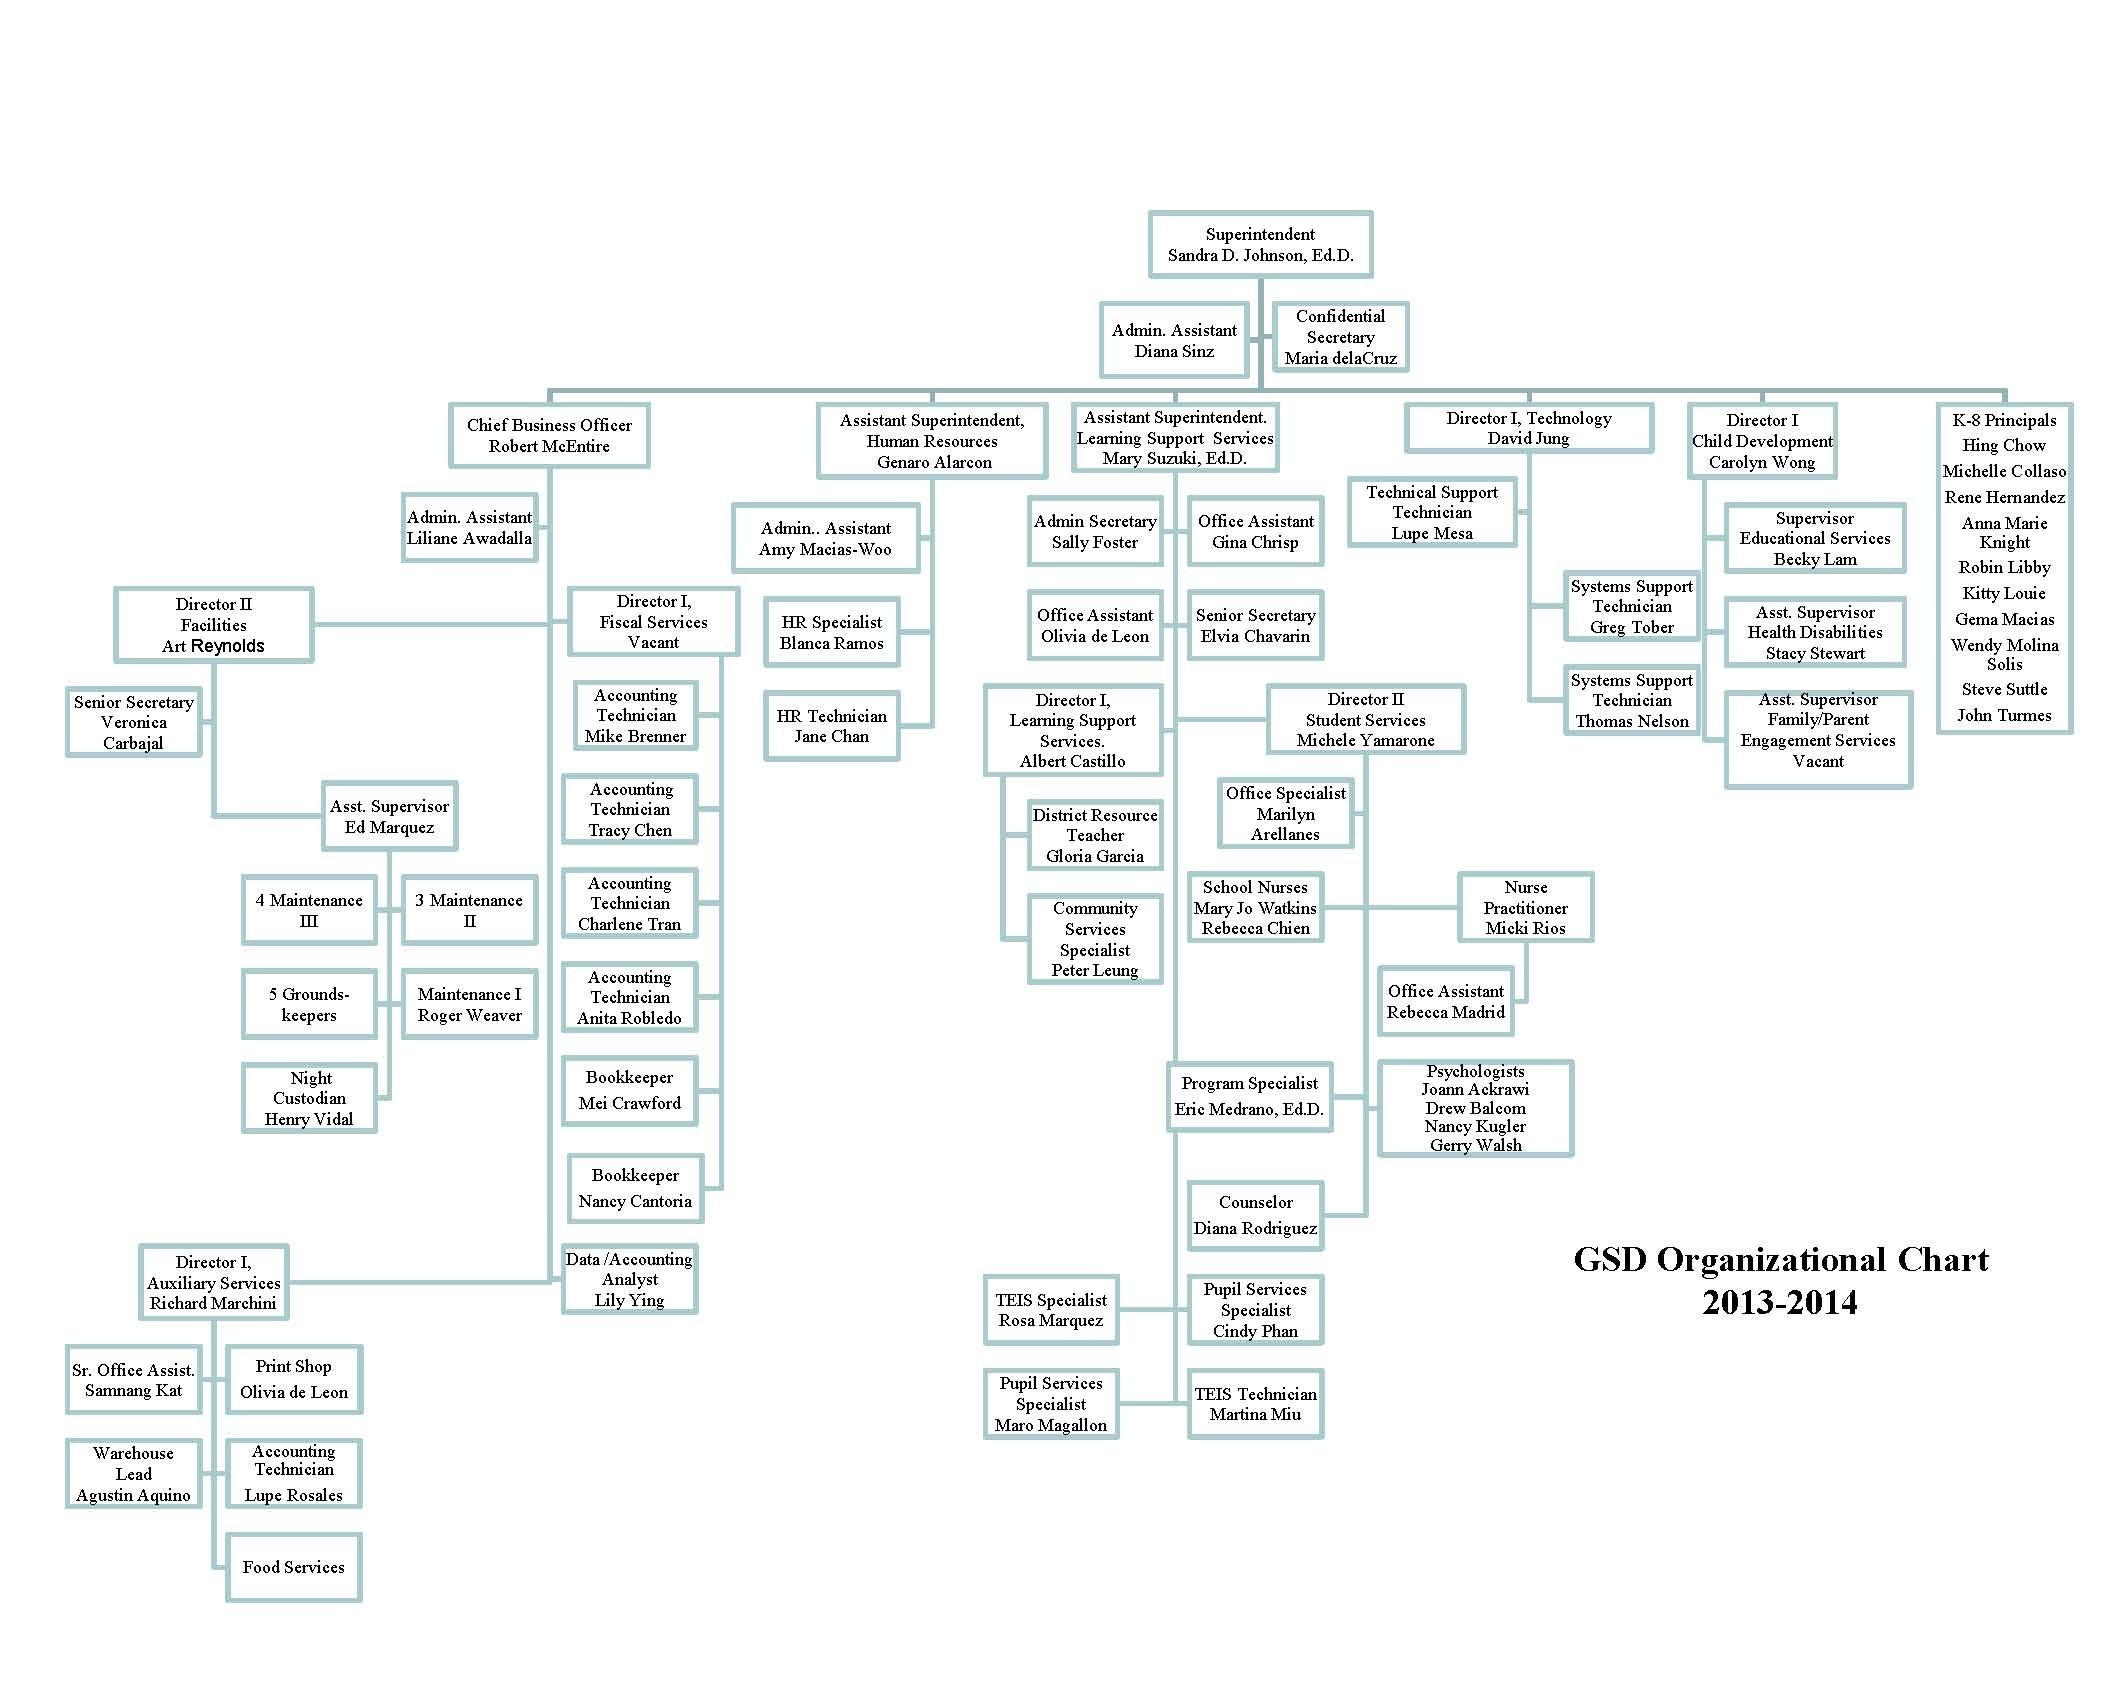 organizational chart 2013 2014 Department of veterans affairs organizational chart 2 3 organizational chart organizational levels.